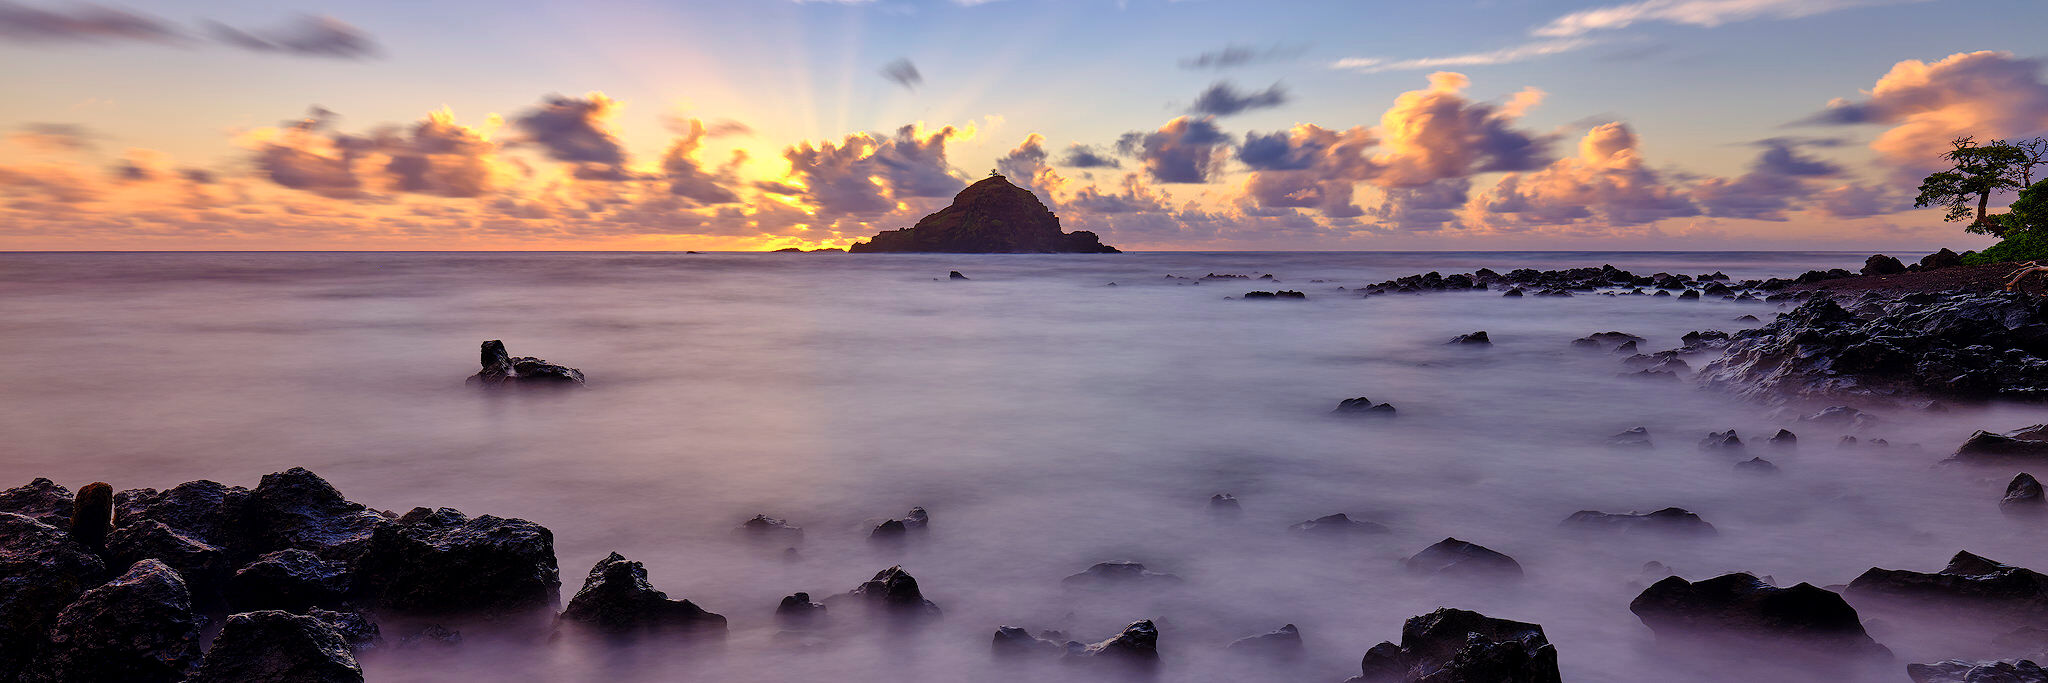 panorama of Koki Beach at sunrise near Hana, Hawaii on the island of Maui